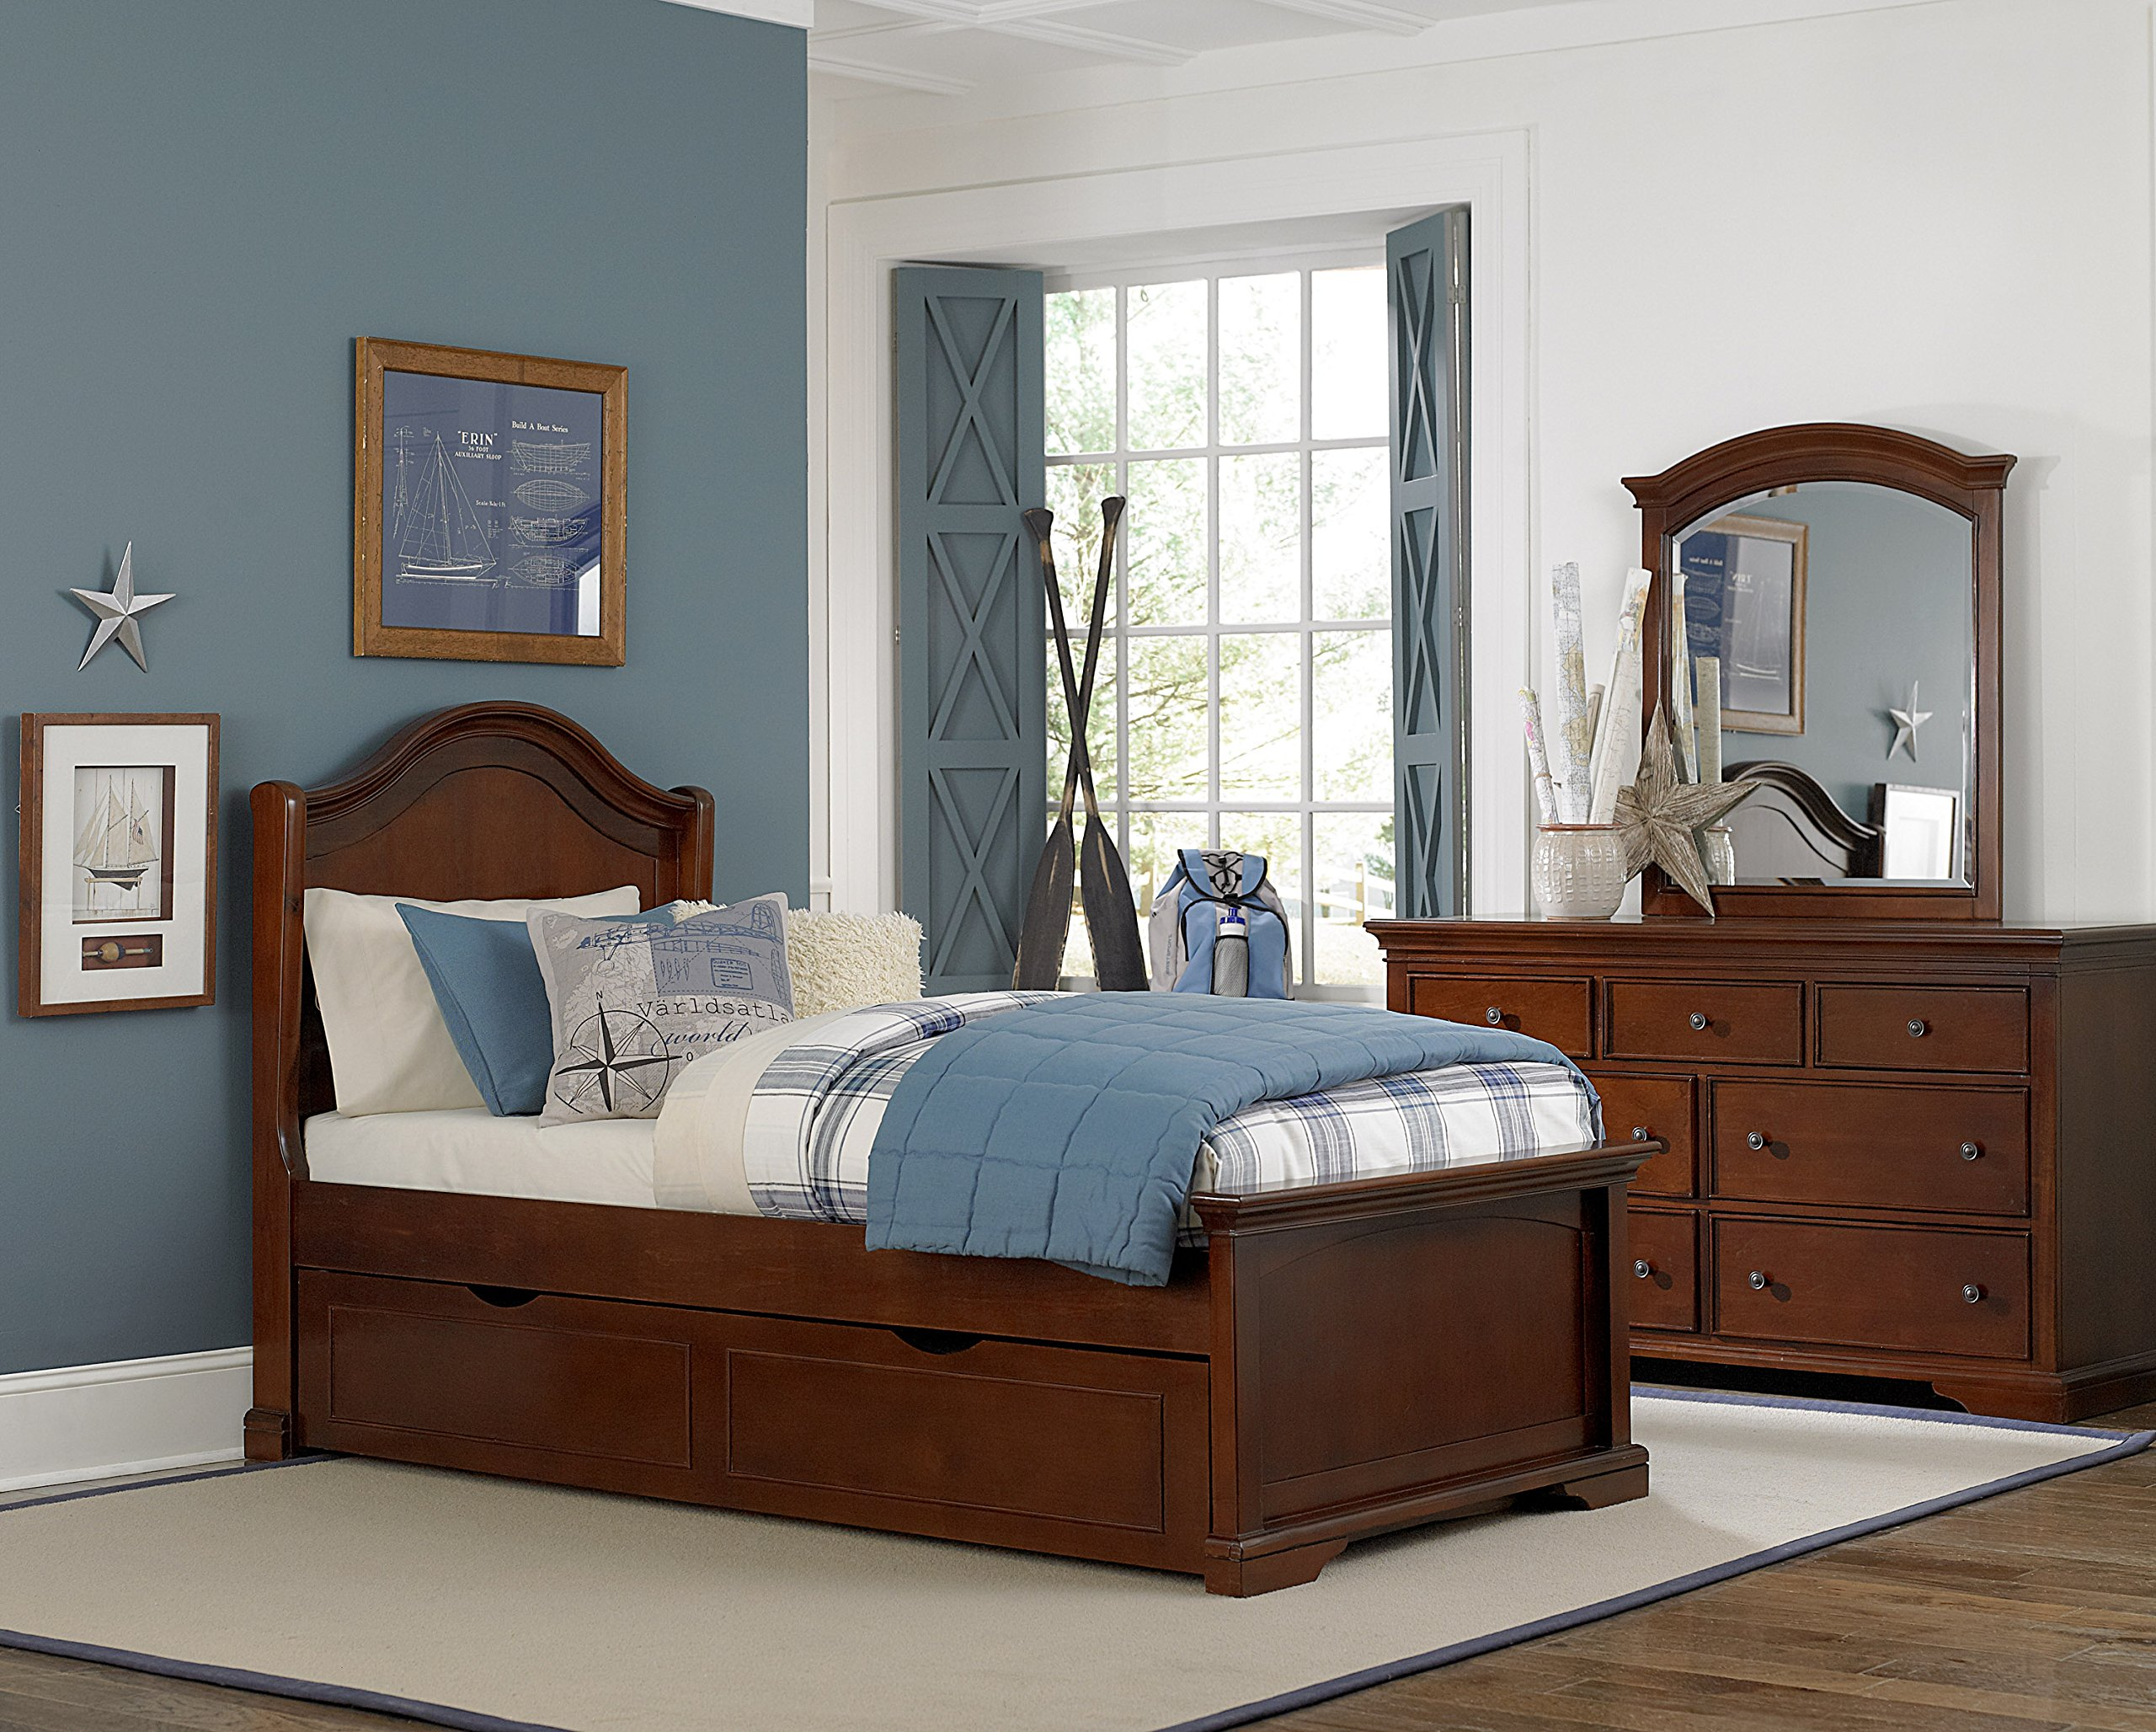 NE Kids Walnut Street Morgan Arch Bed with Trundle, Chestnut, Twin